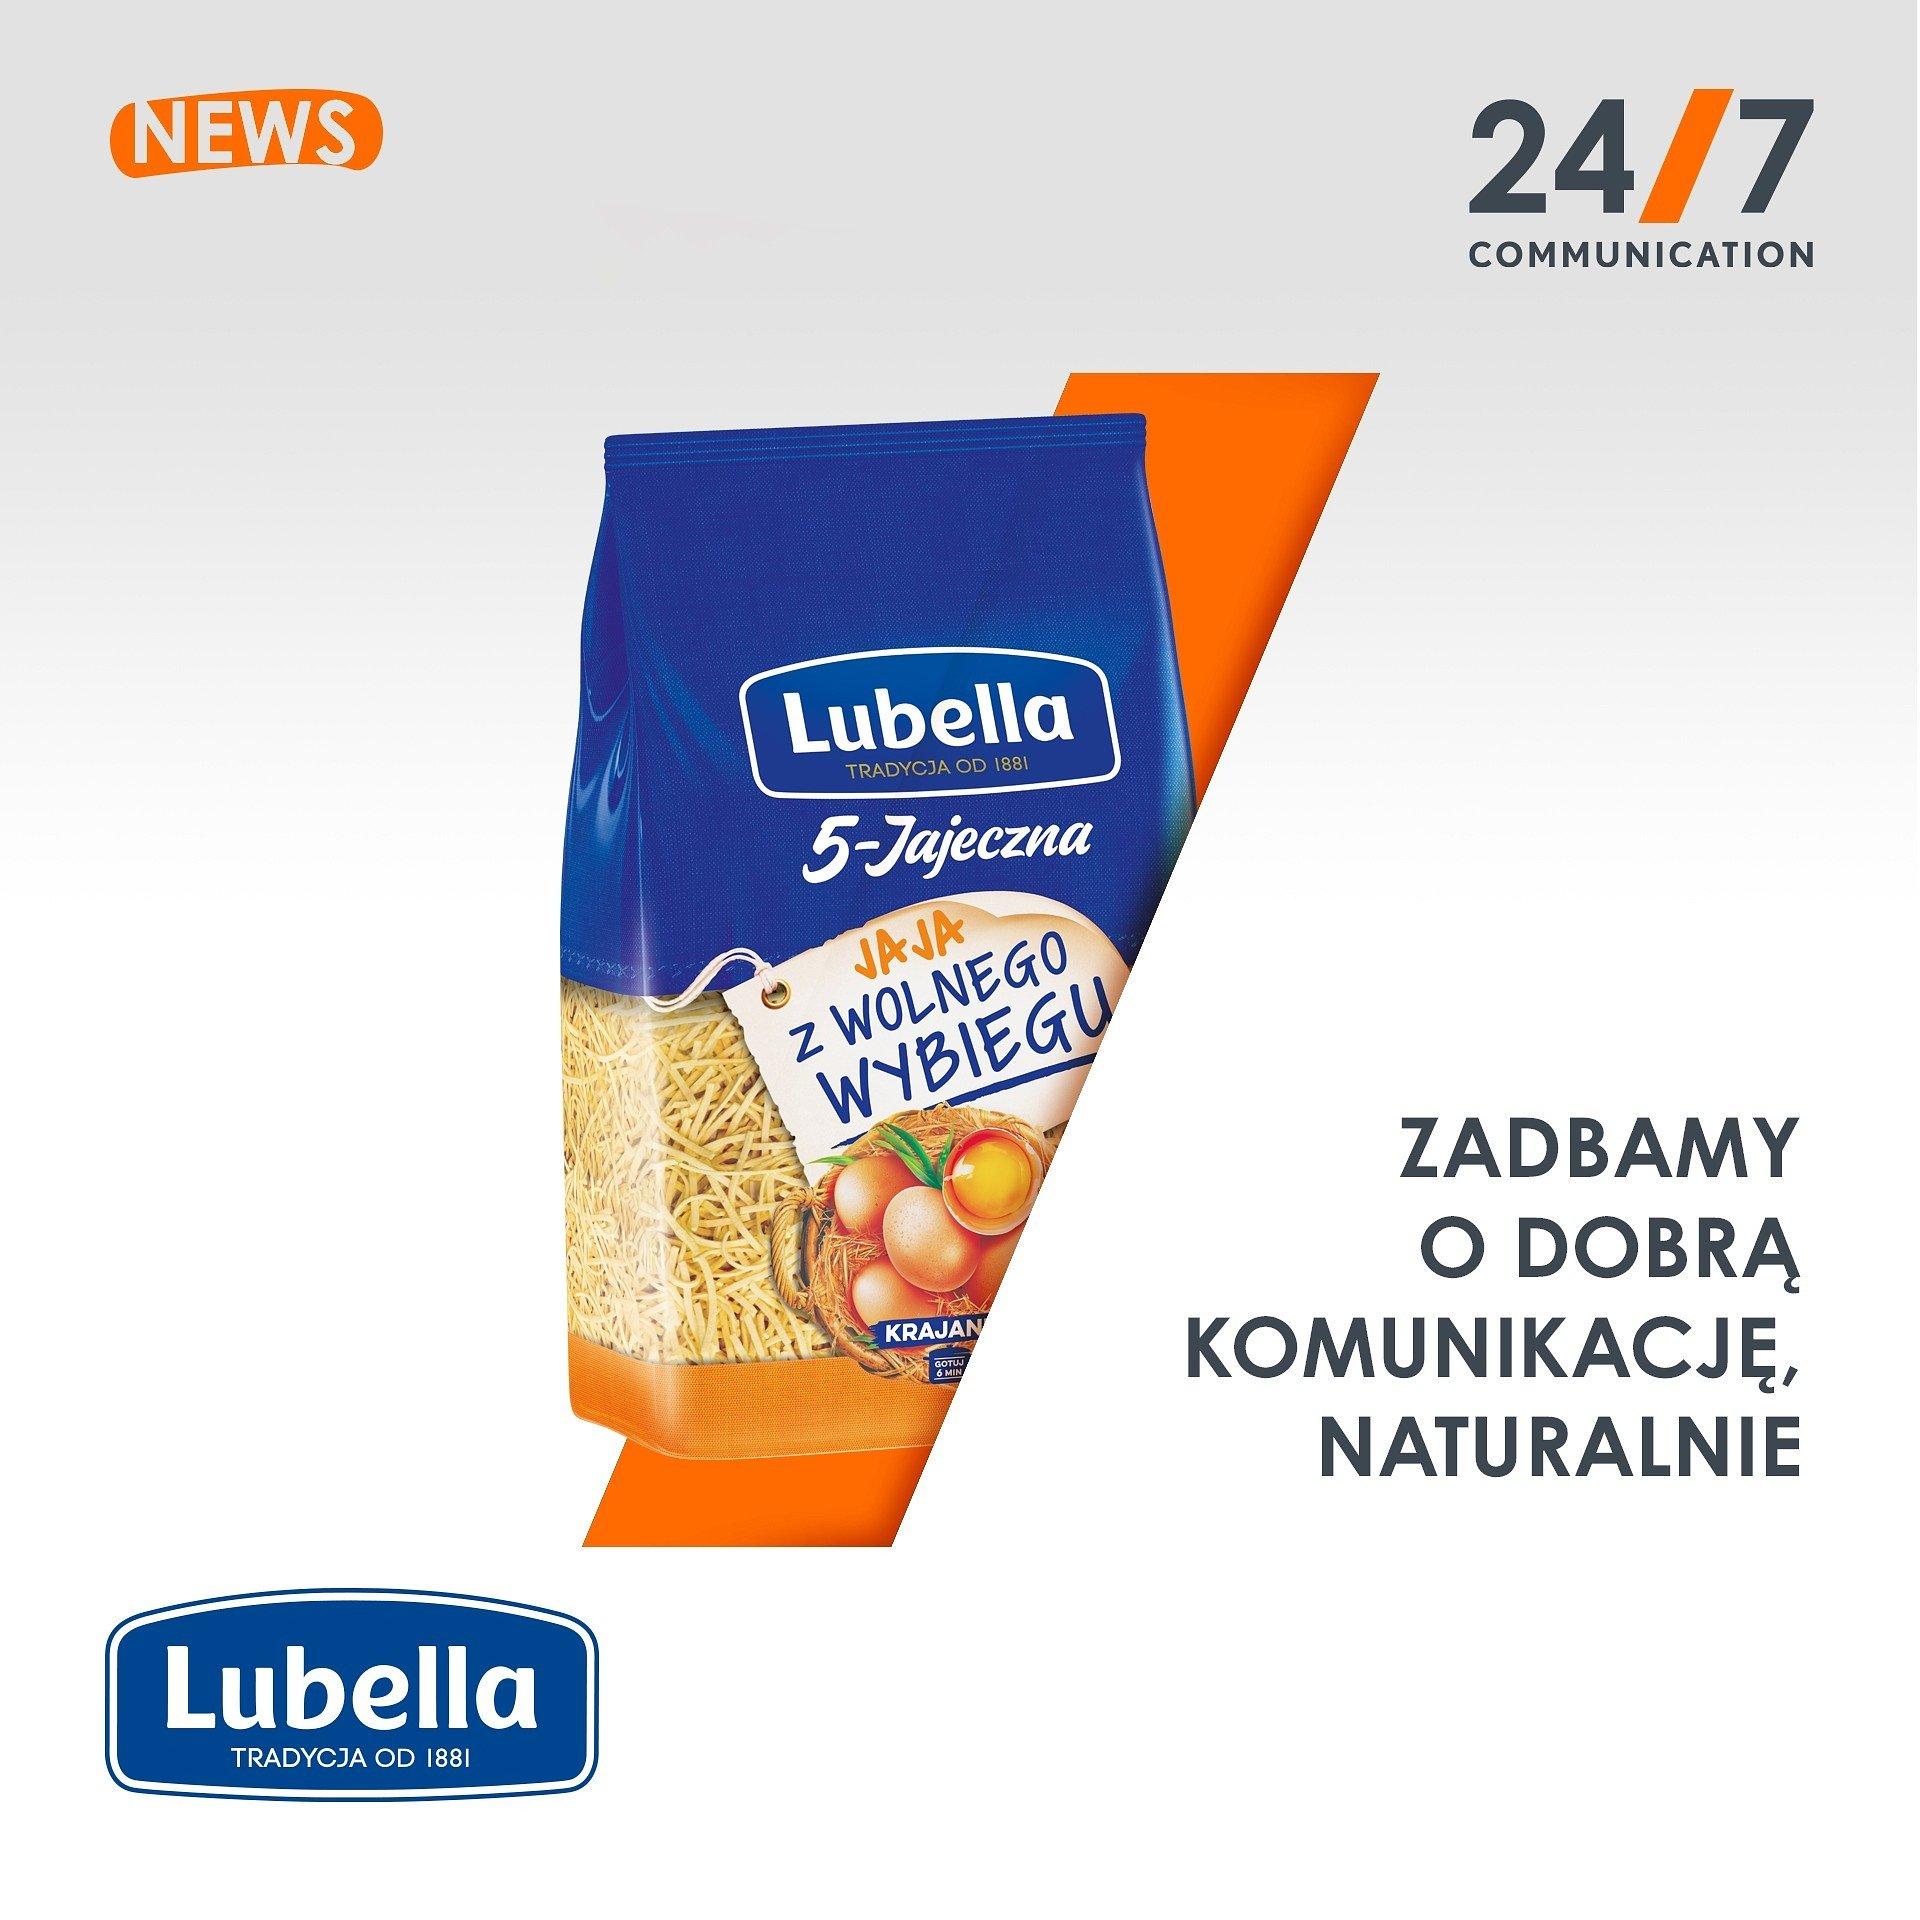 Lubella nowym klientem 24/7Communication